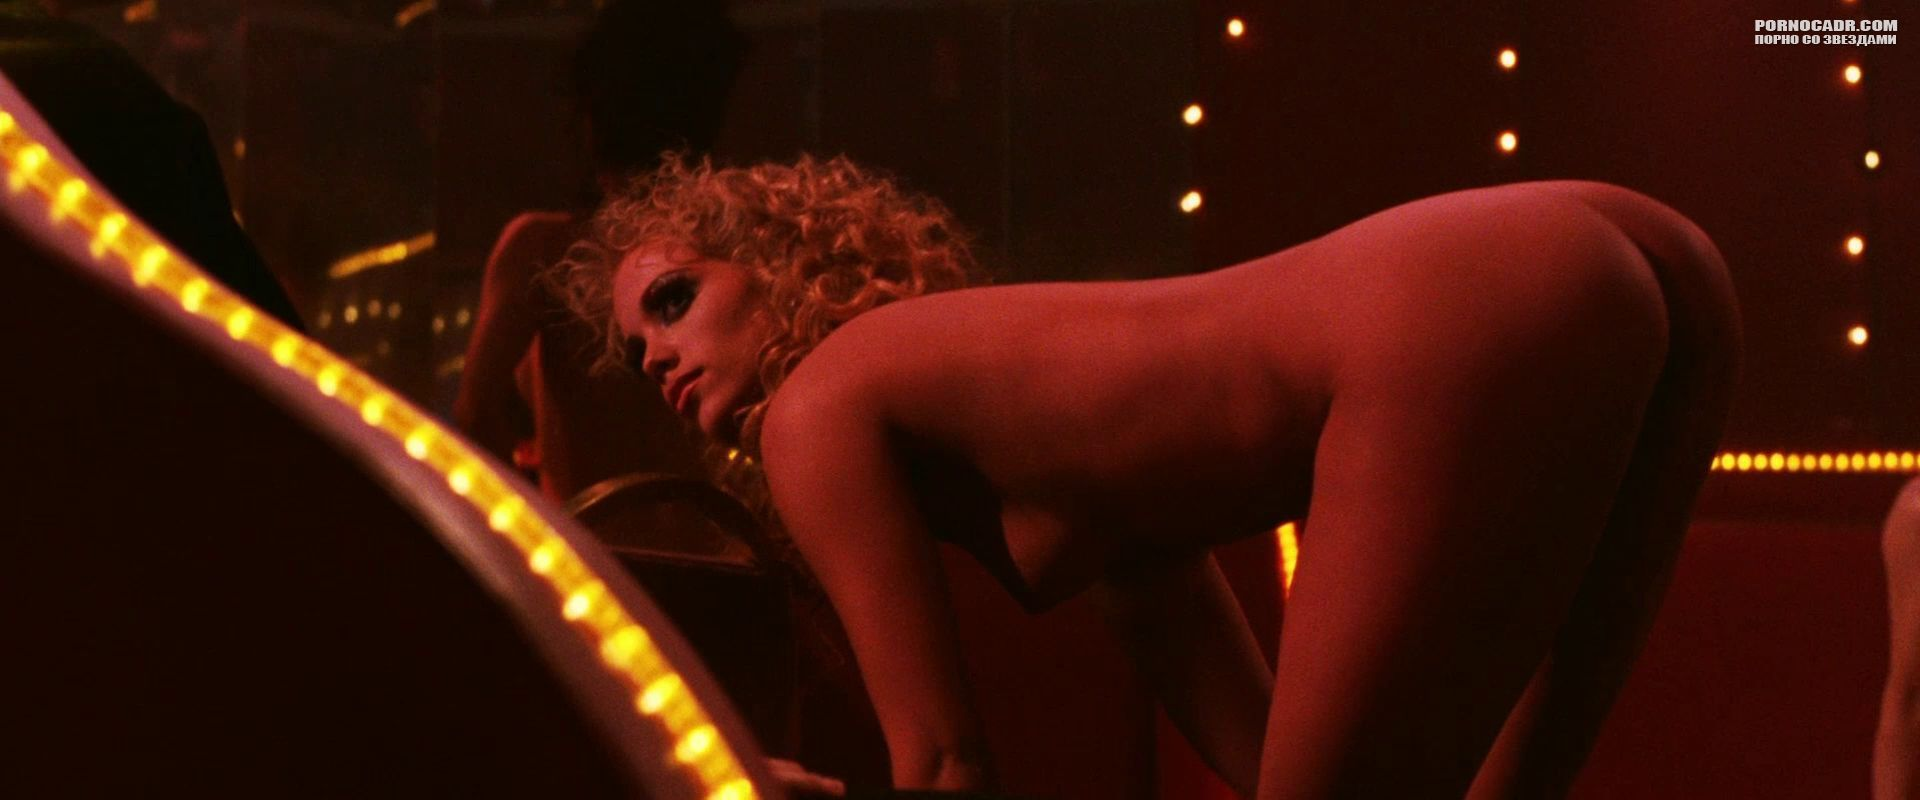 Showgirls sex scene video — 13